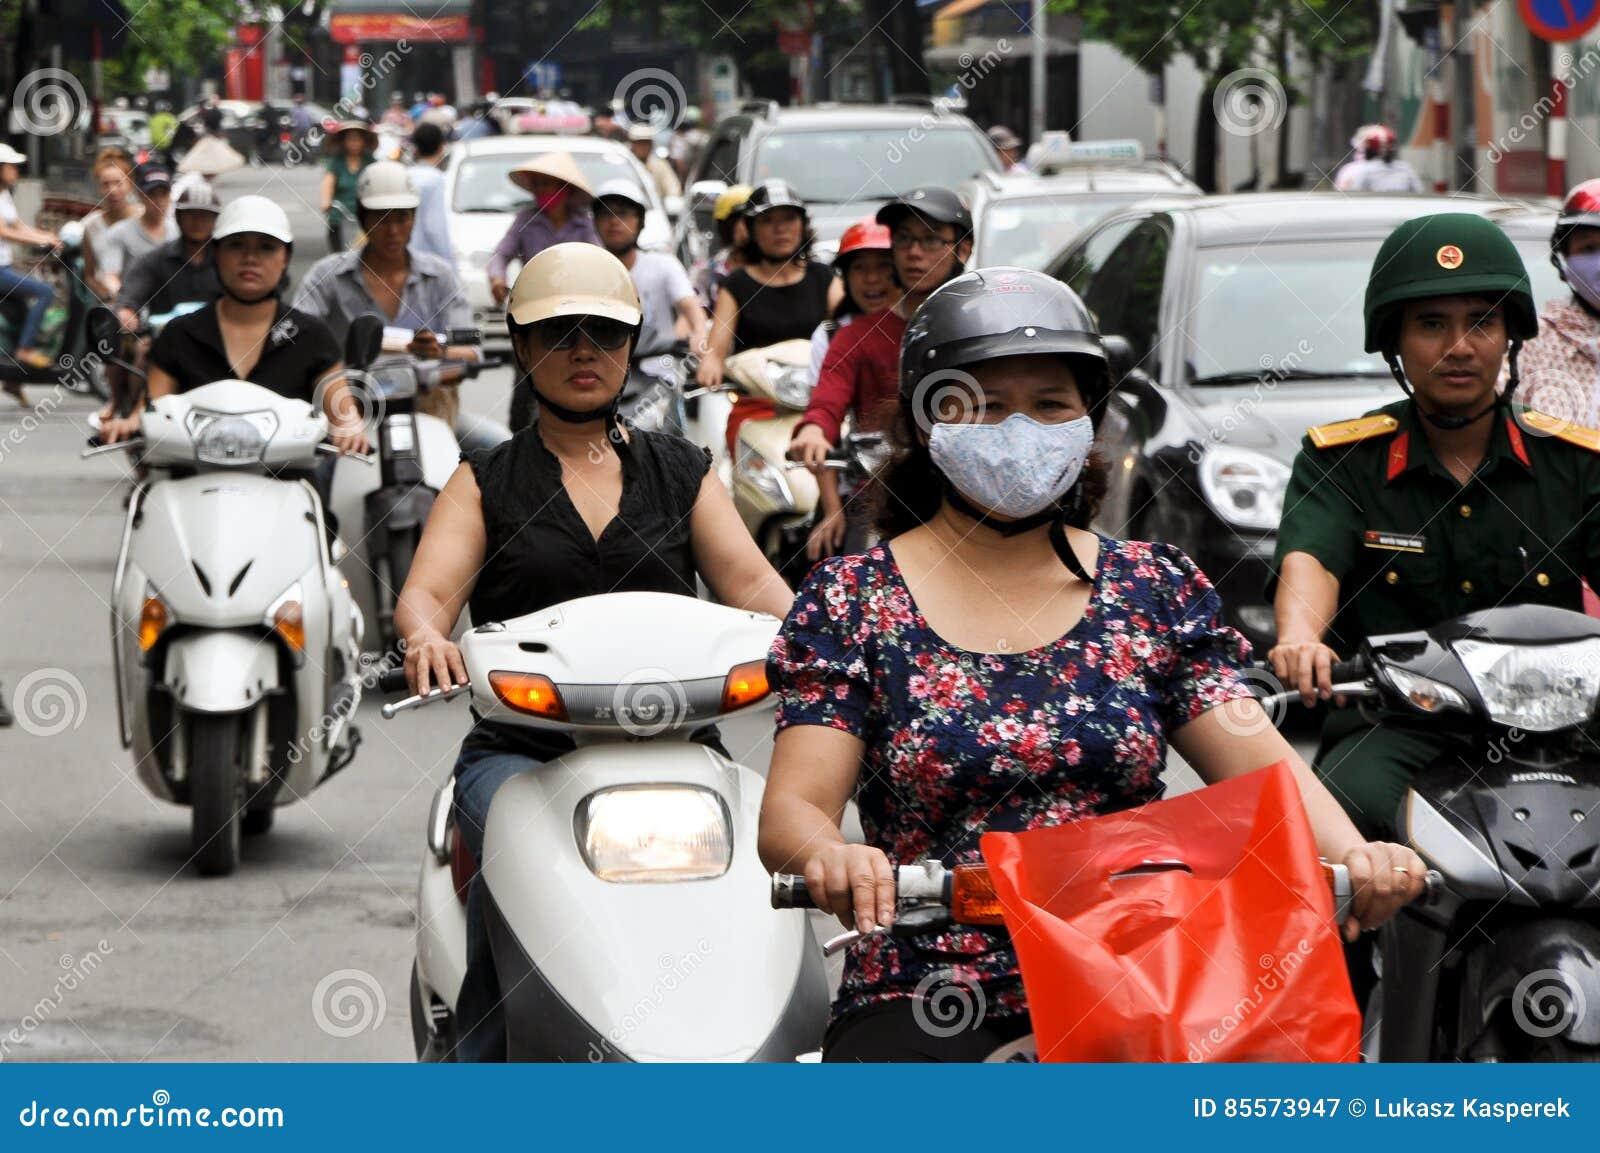 Tung trafik i Saigon